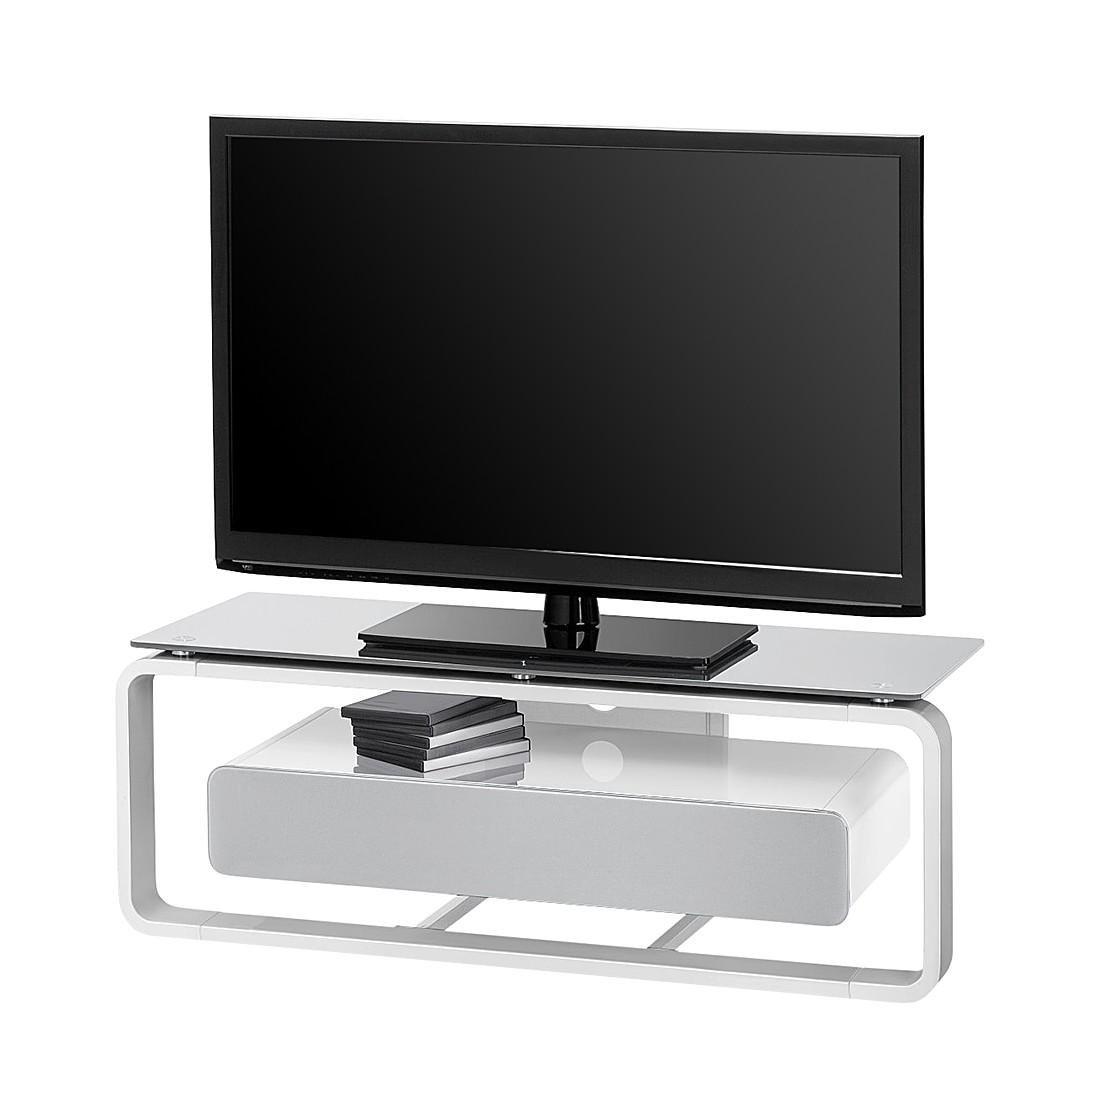 TV-Rack Shanon - Weiß / Glas Platingrau - 110 cm, Maja Möbel